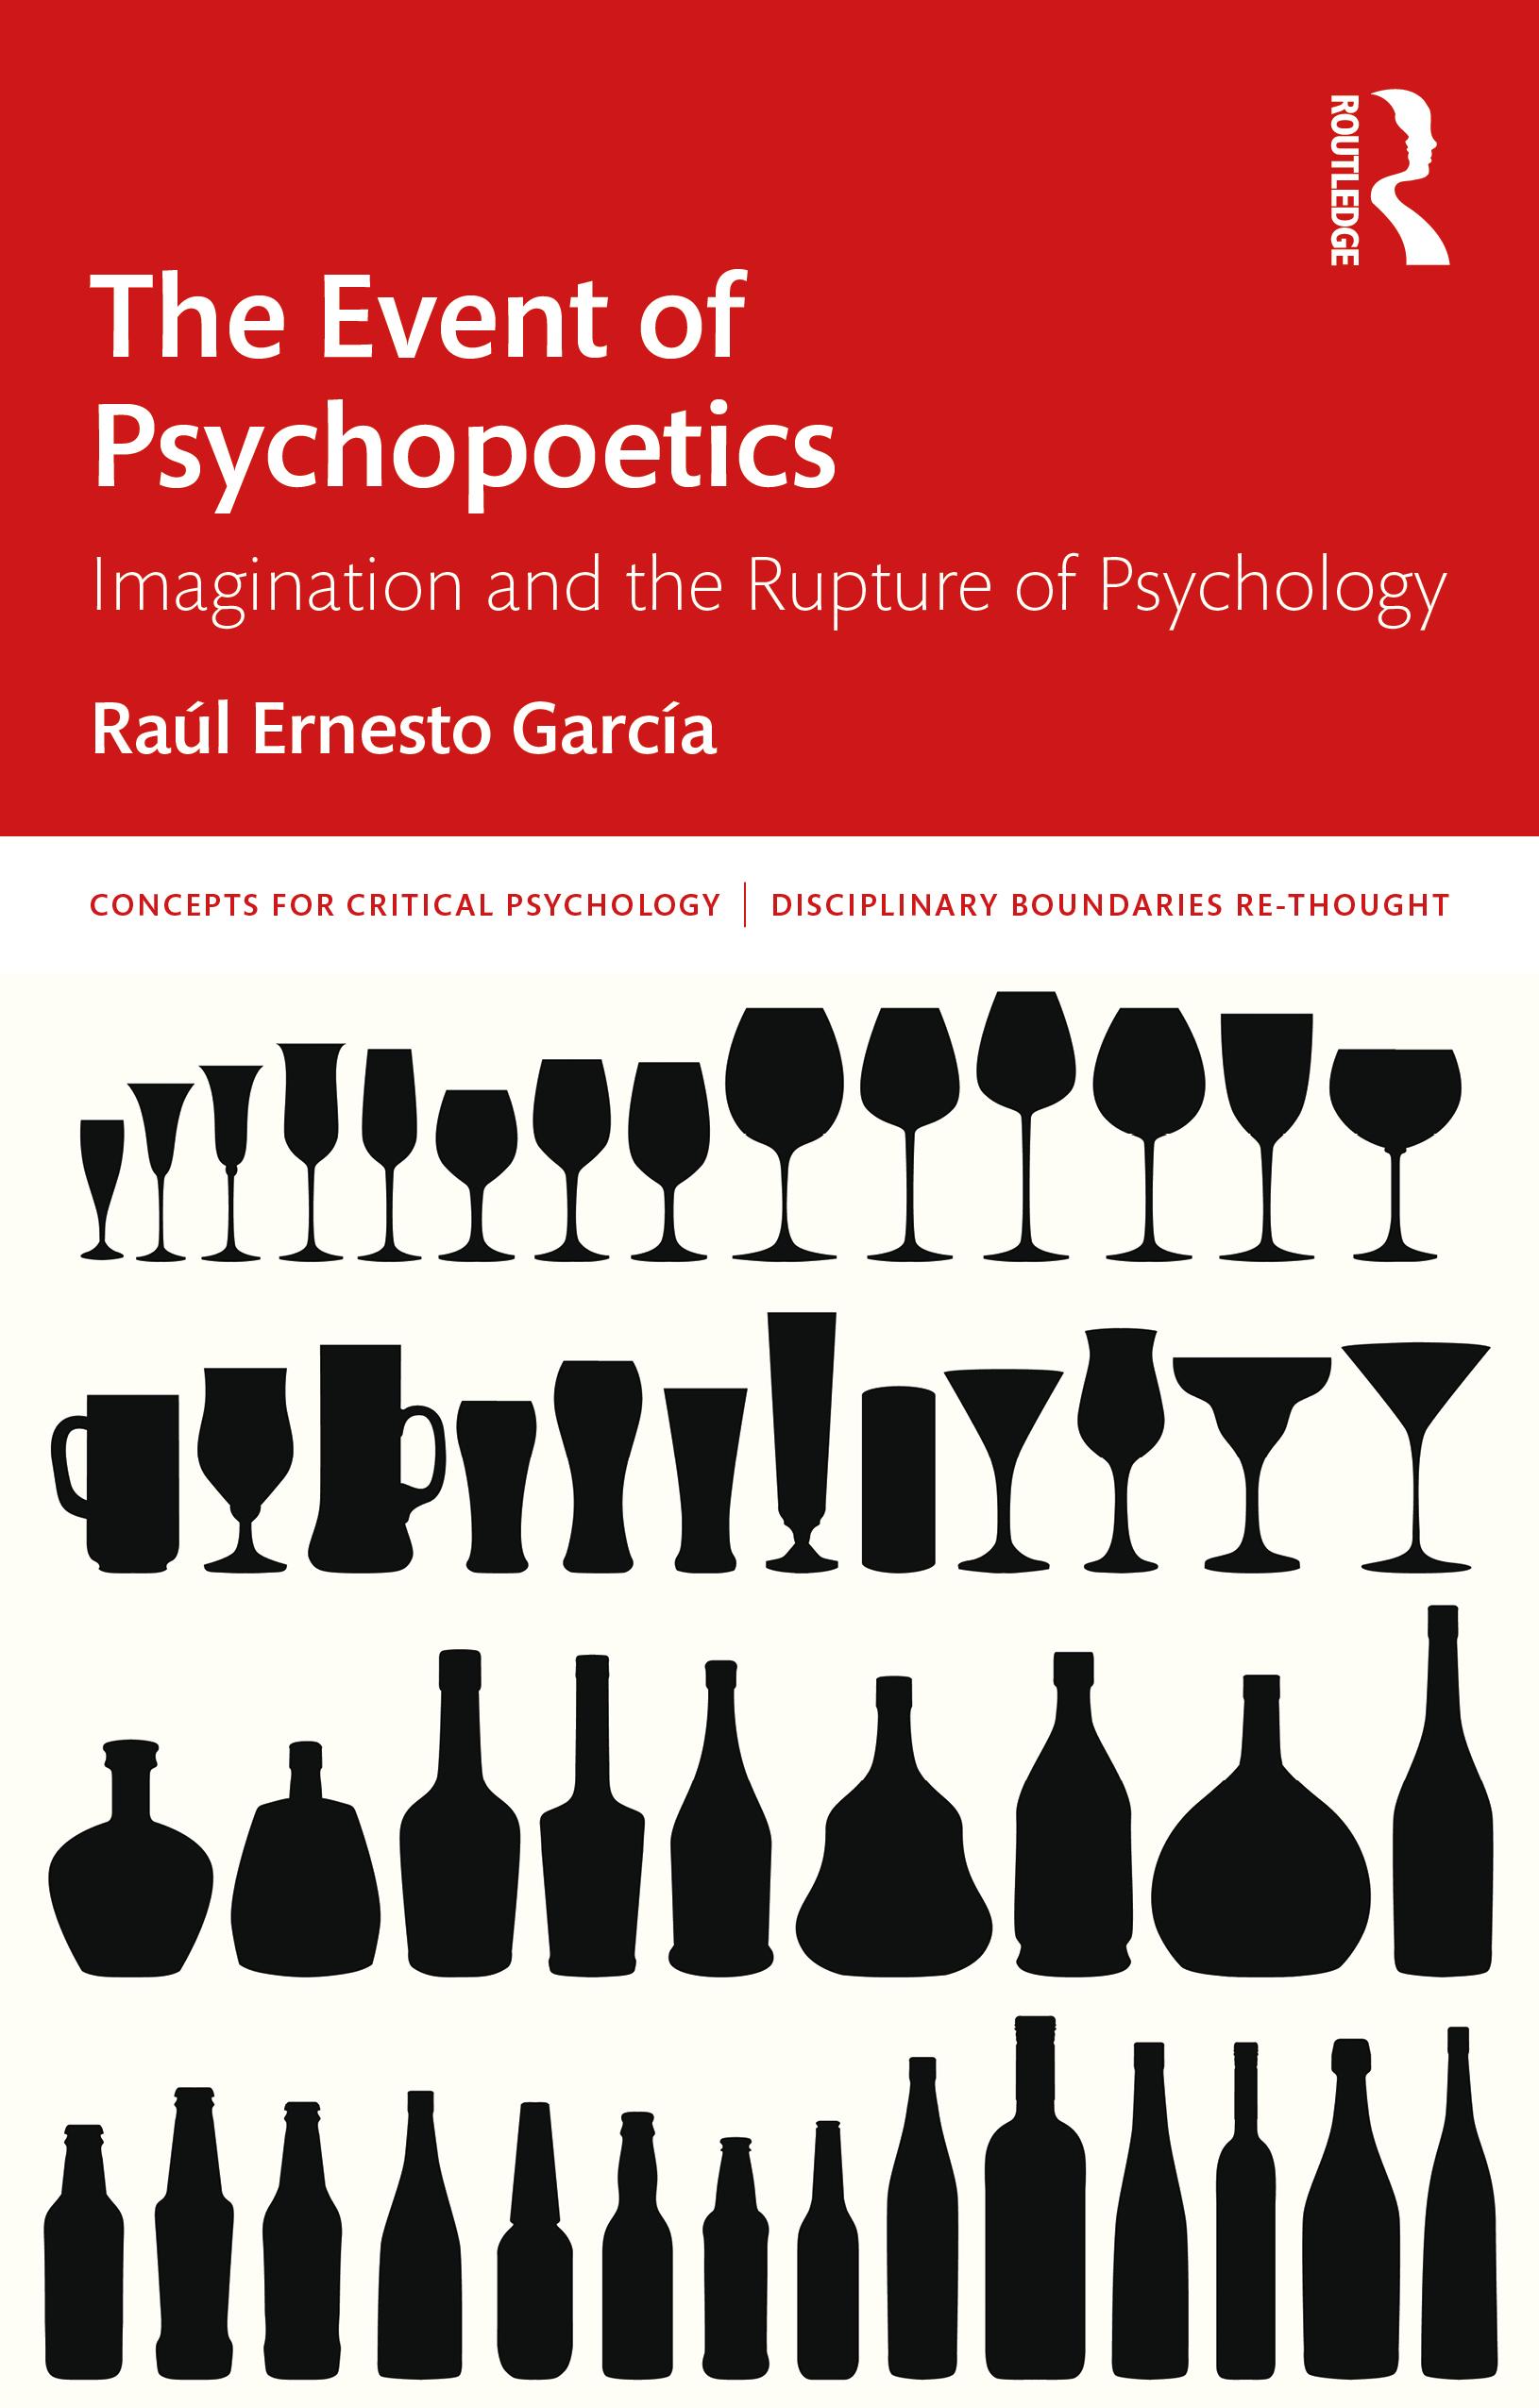 The Event of Psychopoetics